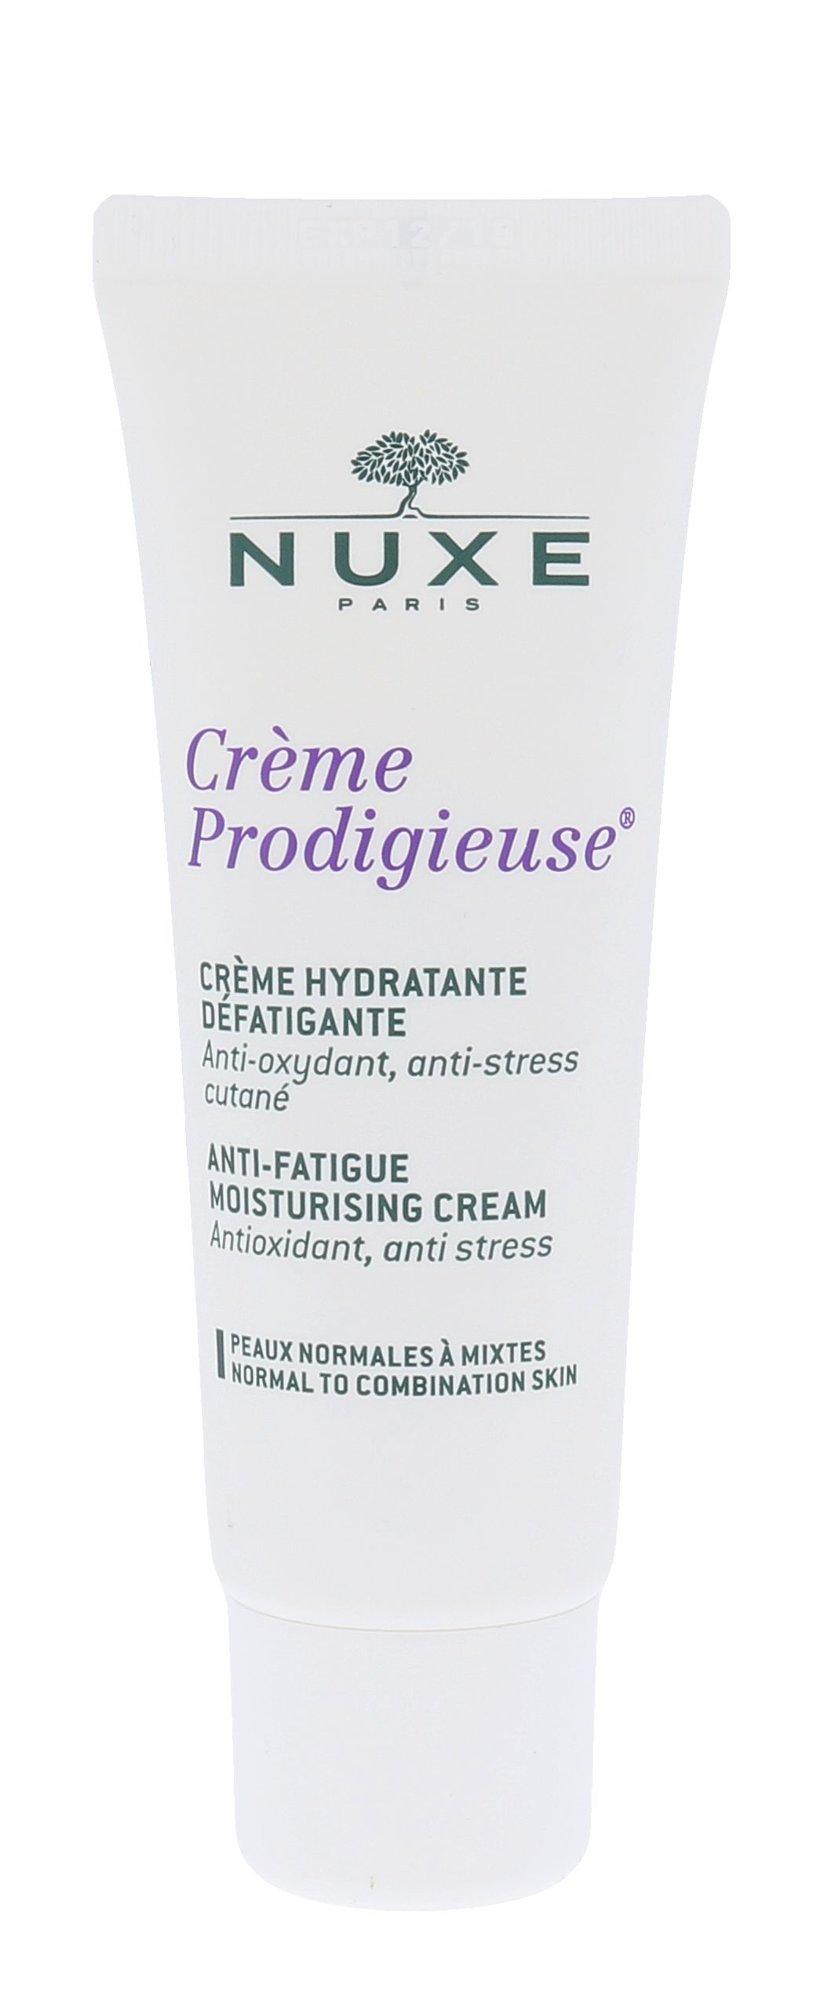 NUXE Creme Prodigieuse Cosmetic 40ml